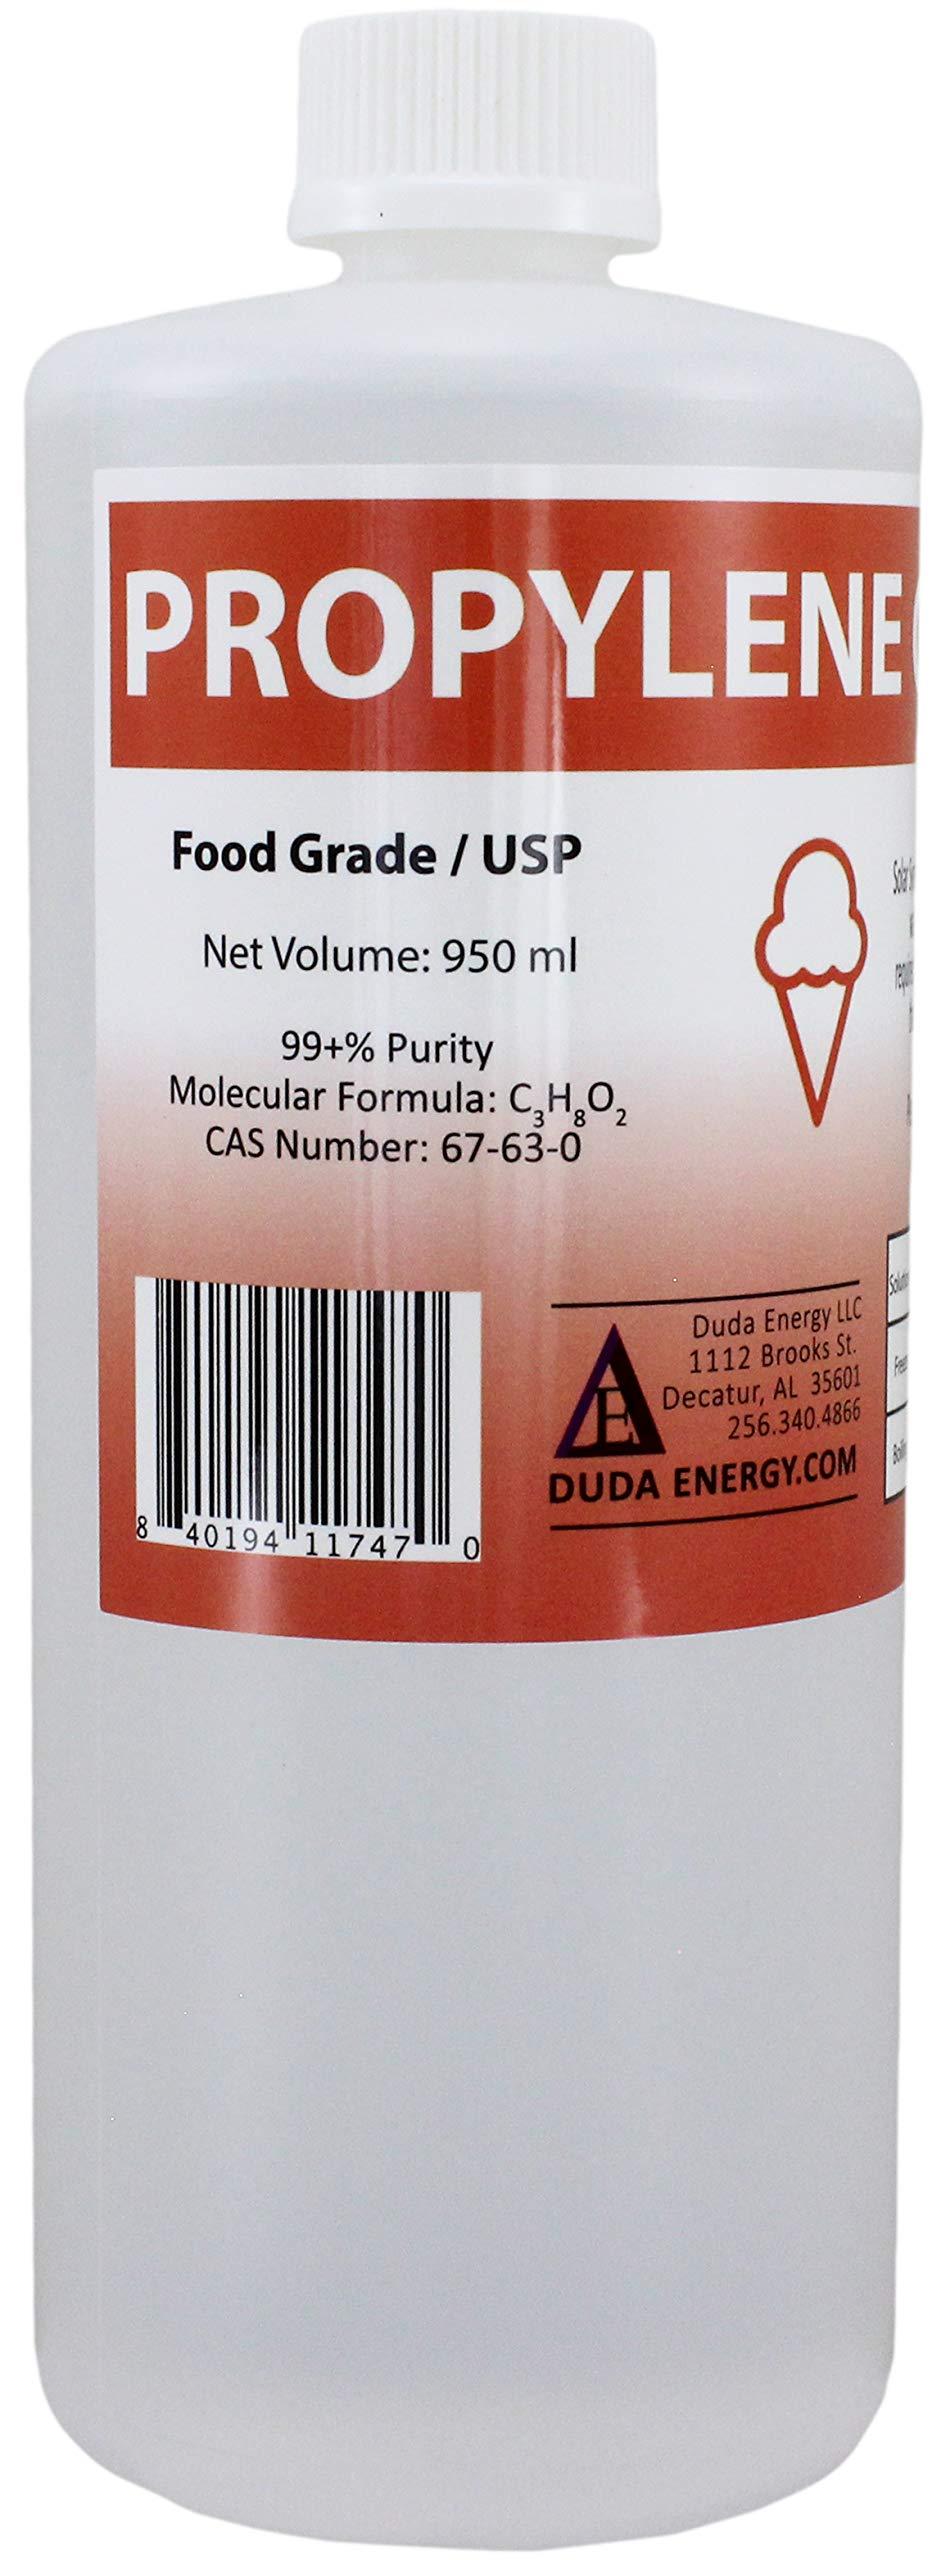 Duda Energy Pg950 1 L Bottle 1 Quart Propylene Glycol Food Grade Usp 99 5 Pure Concentration With Child Safety Cap Buy Online In Grenada At Grenada Desertcart Com Productid 10782218